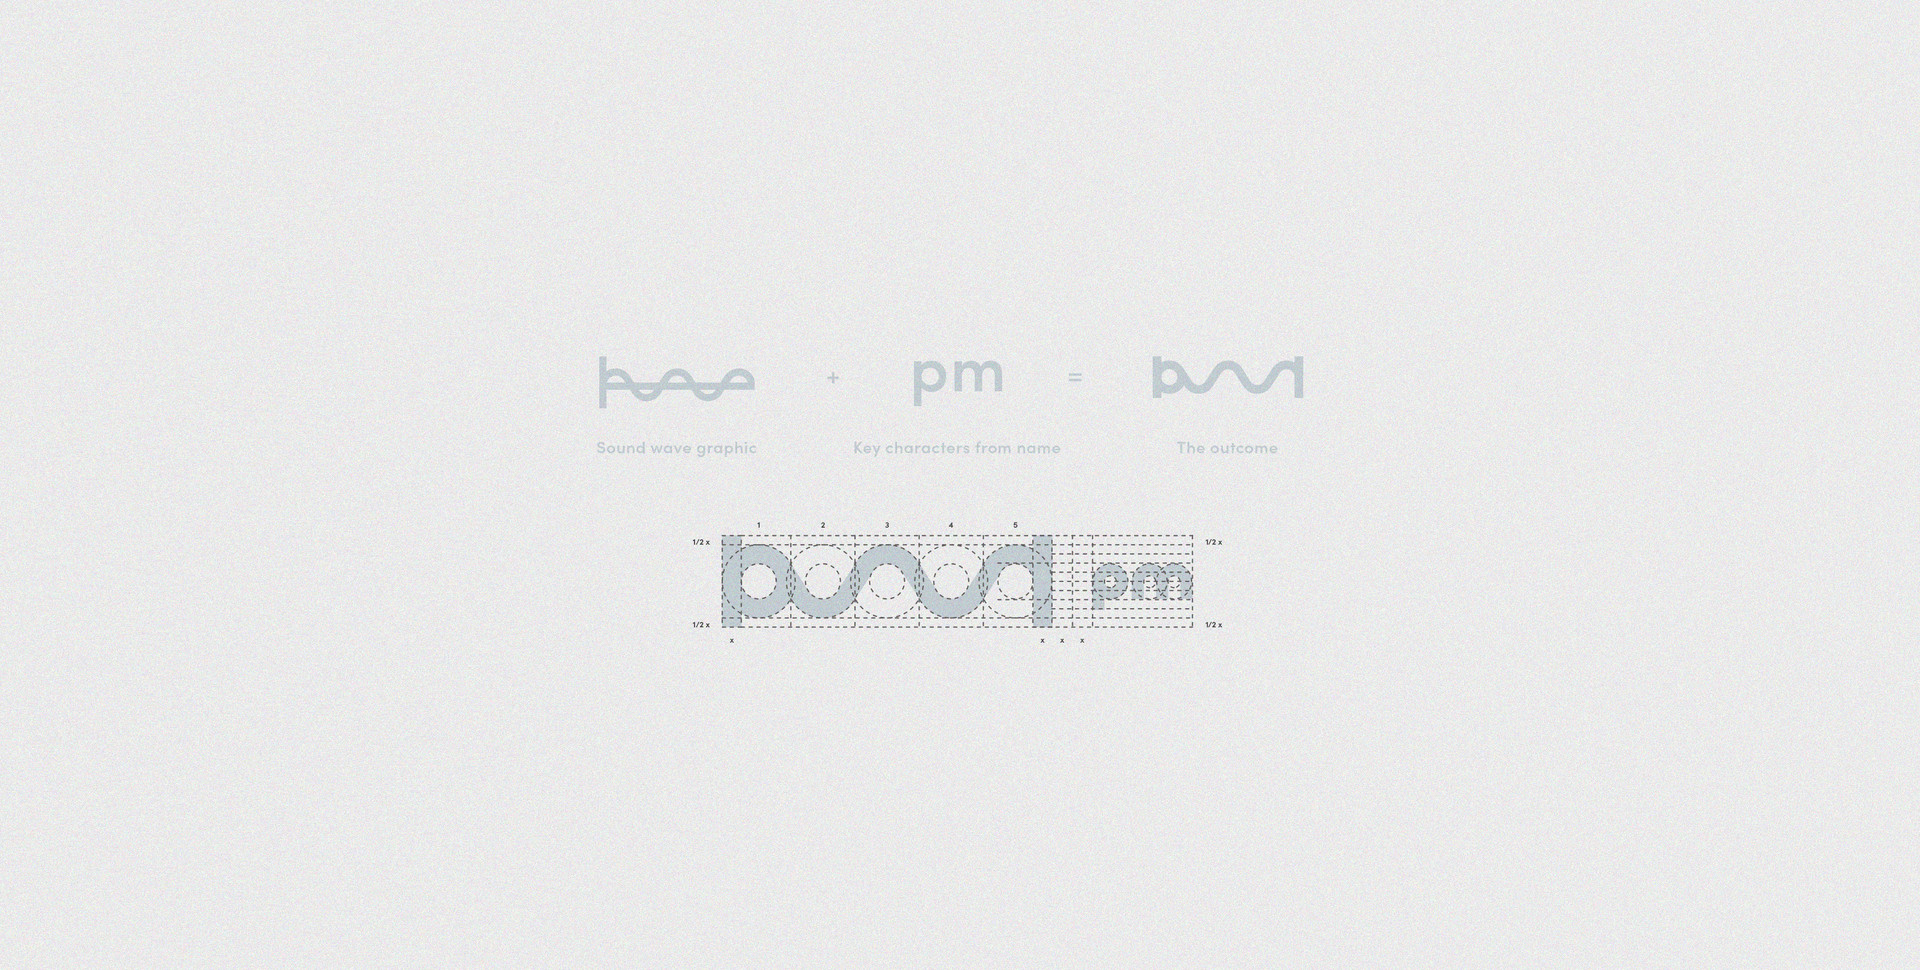 TLL_pm_Logo Construction.jpg